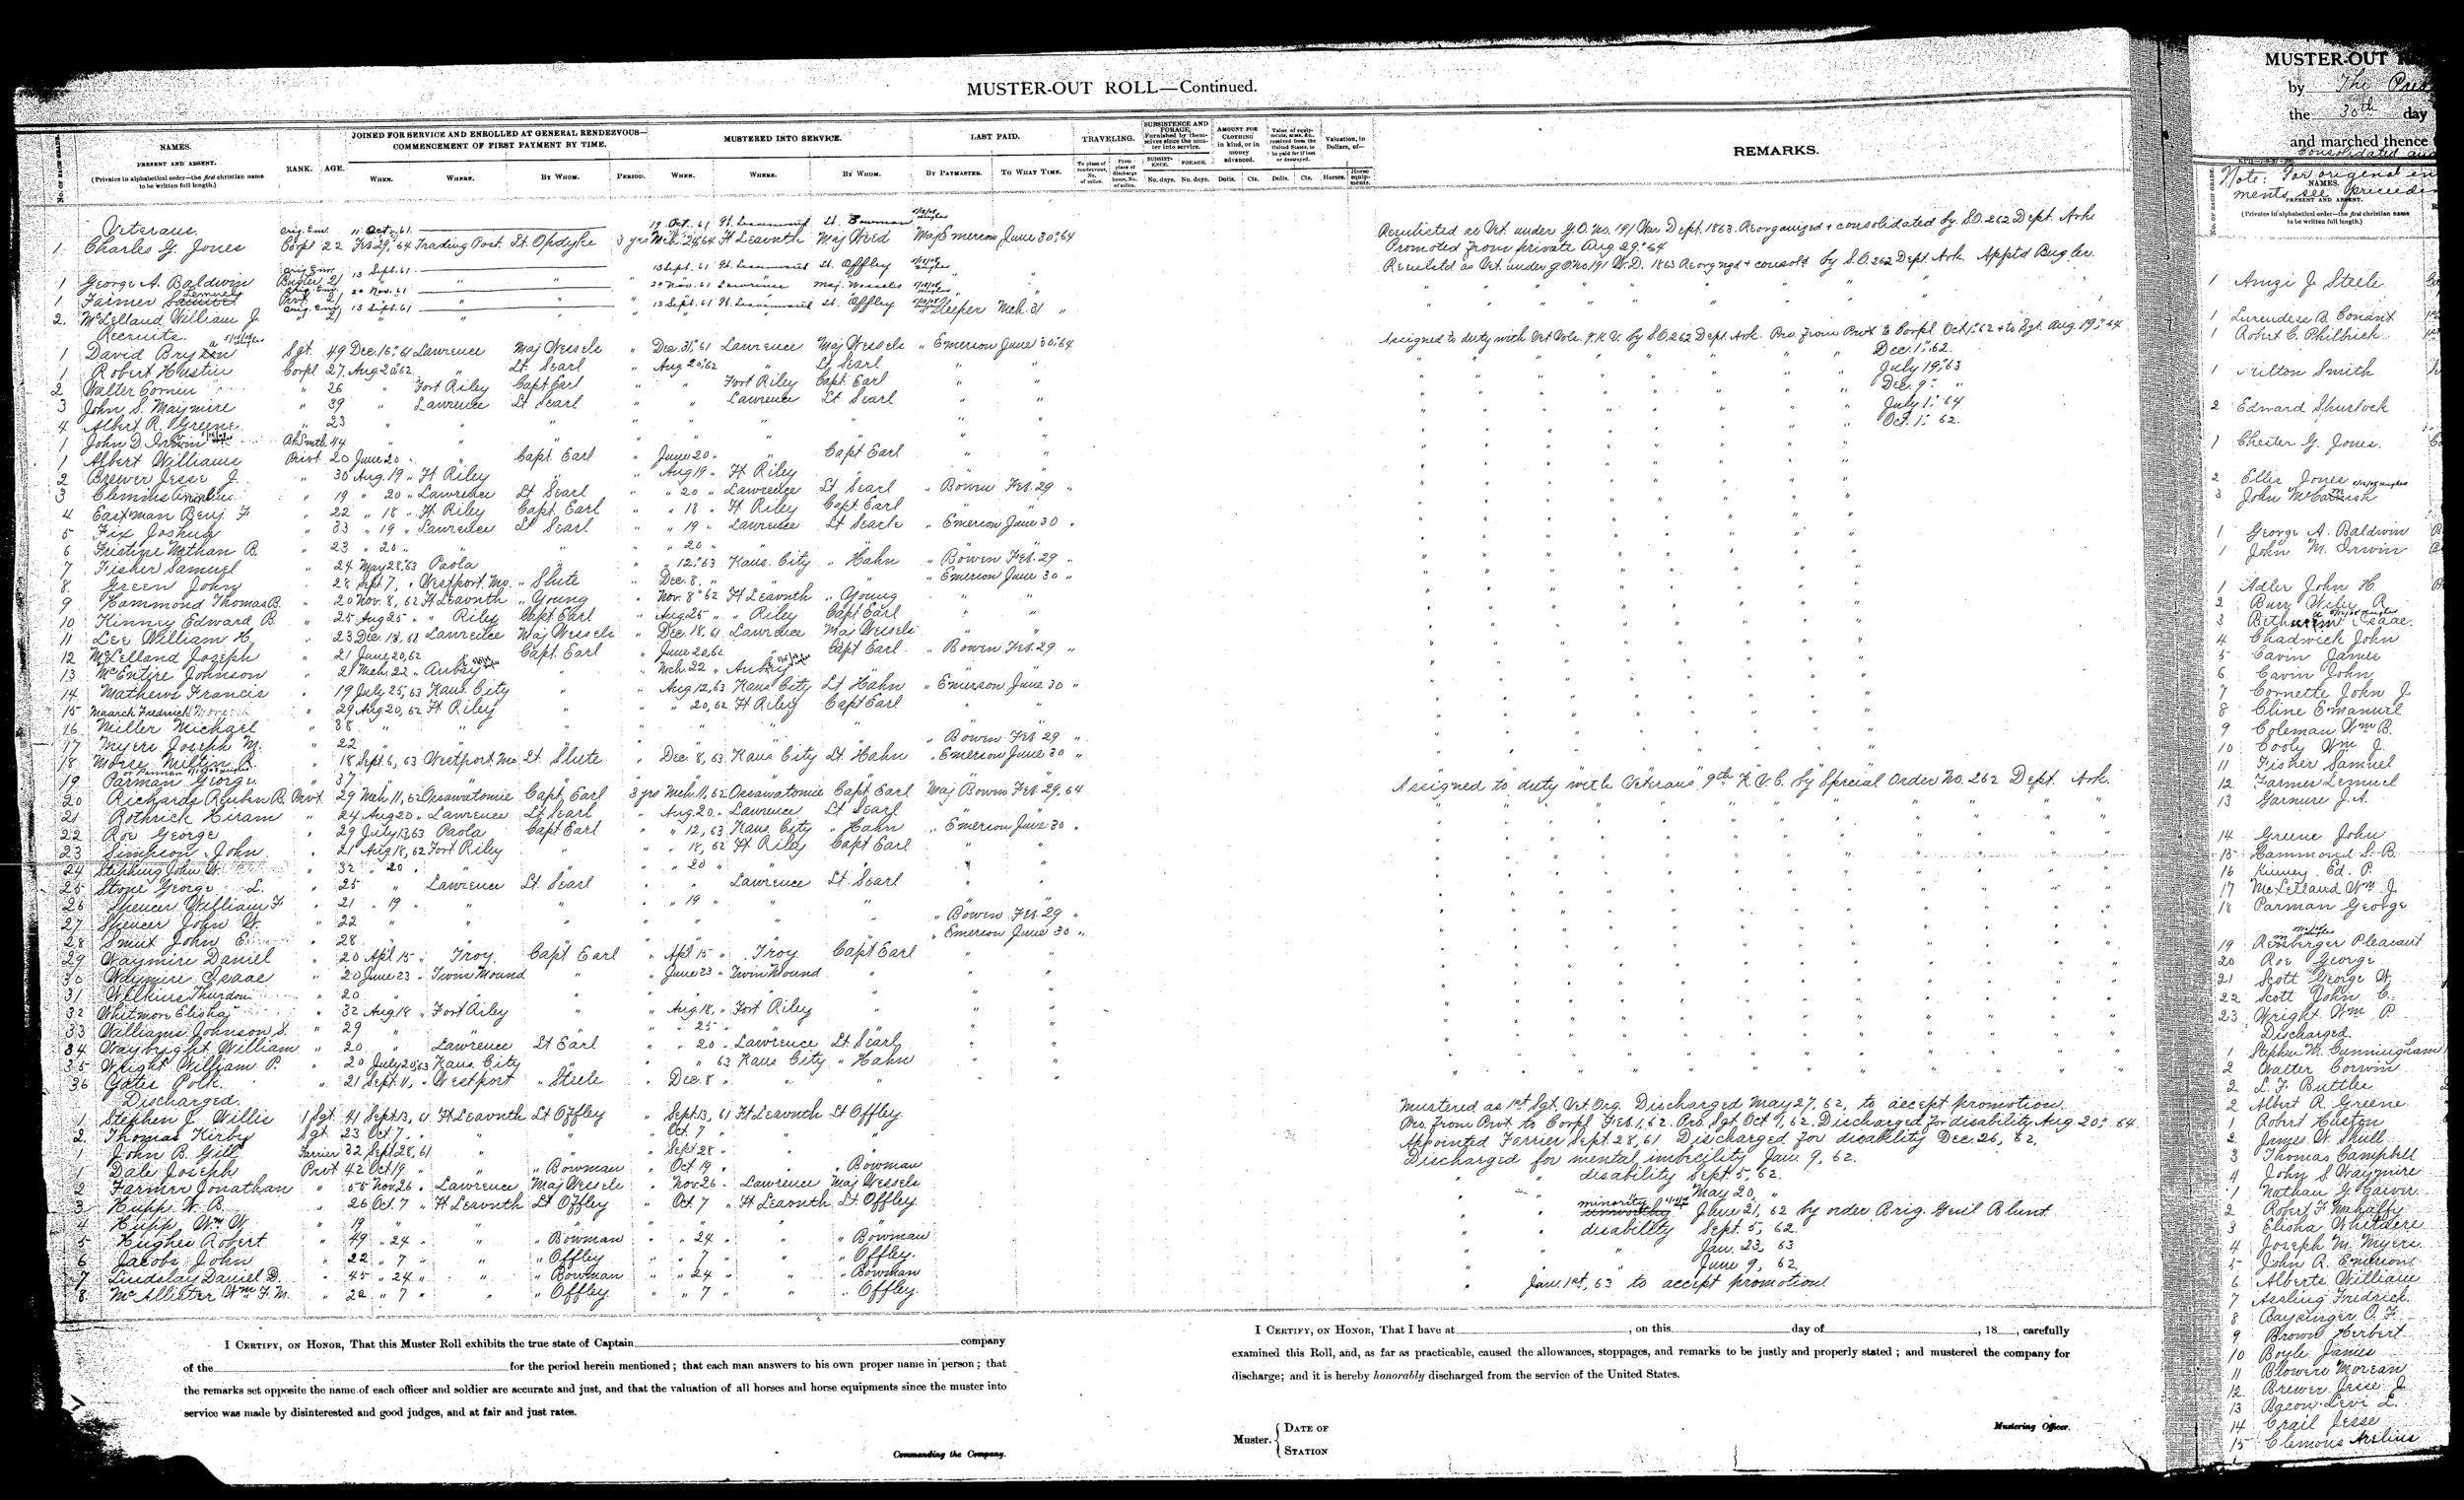 Muster out roll, Ninth Regiment, Cavalry, Kansas Civil War Volunteers regiment, volume 3 - 7